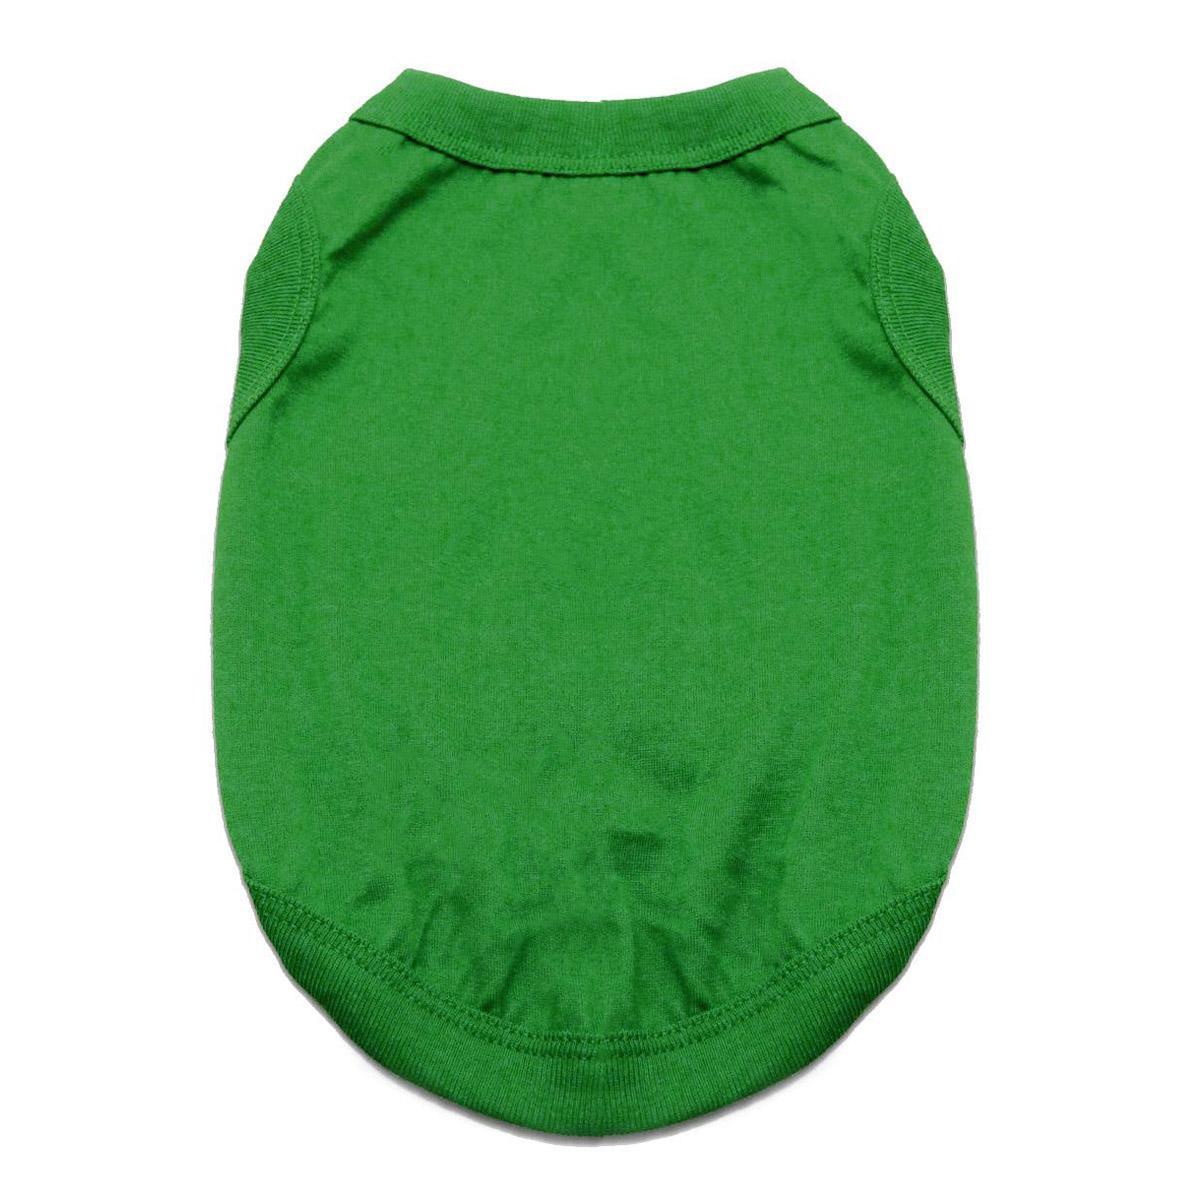 Doggie Design 100% Cotton Dog Tank, Emerald Green, XX-Large